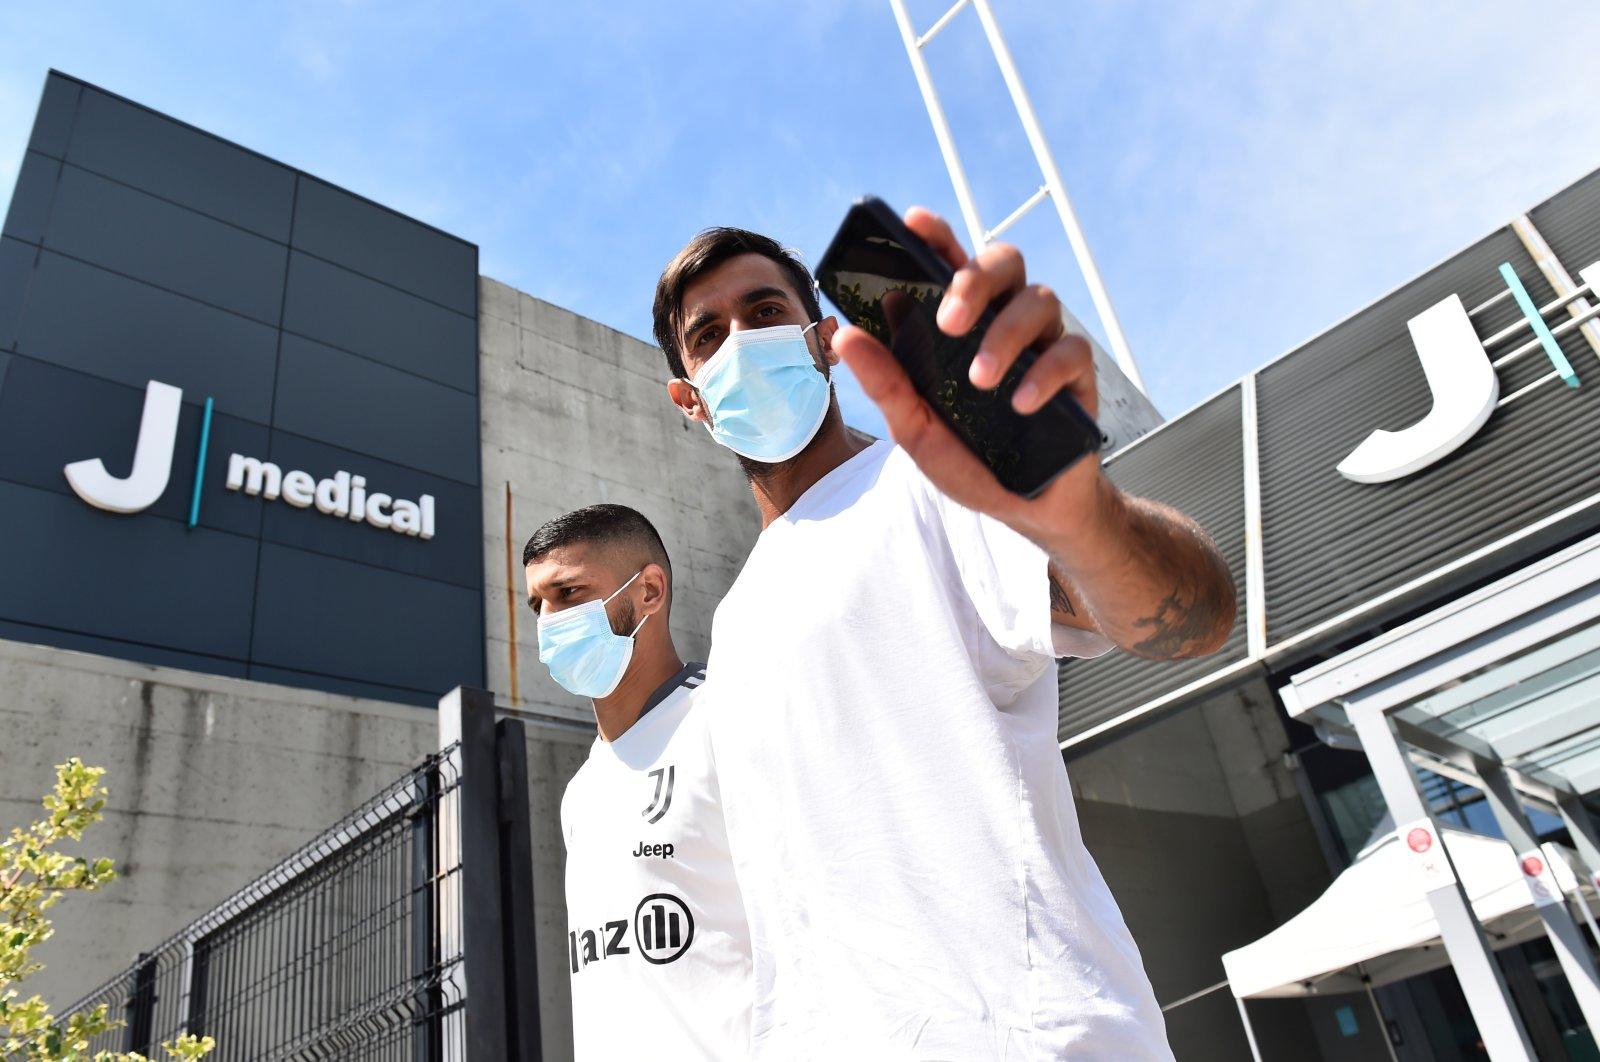 Juventus' Mattia Perin and Hamza Rafia (L) arrives for training at Juventus Training Center, Turin, Italy, July 14, 2021. (Reuters Photo)